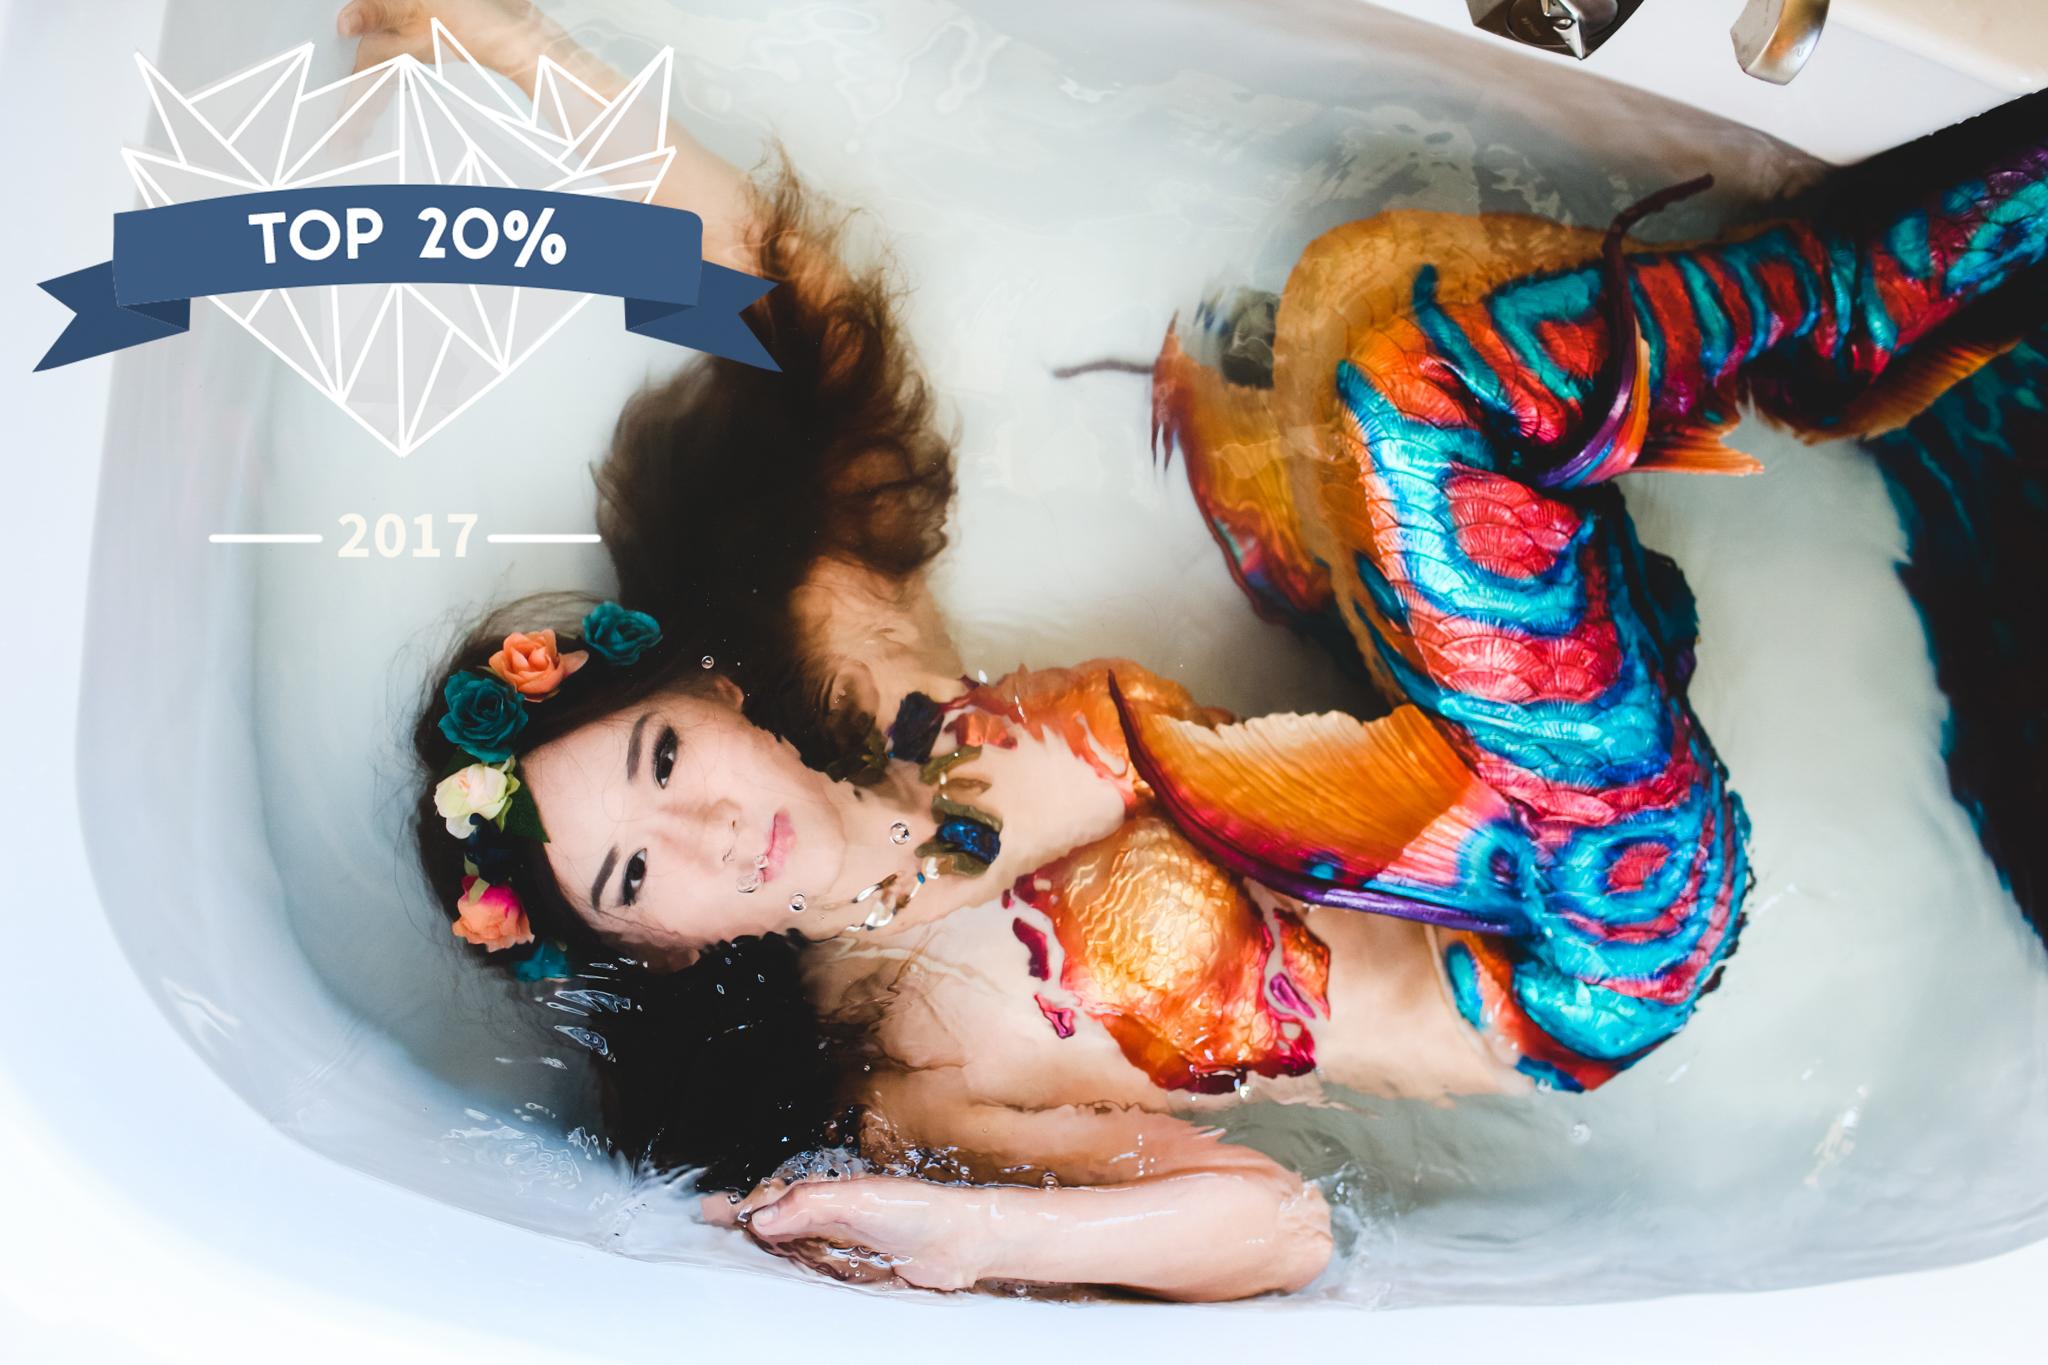 non watermarked 2017 shoot and share photo awards aloha sunshine photography 14October 17, 2016.jpg